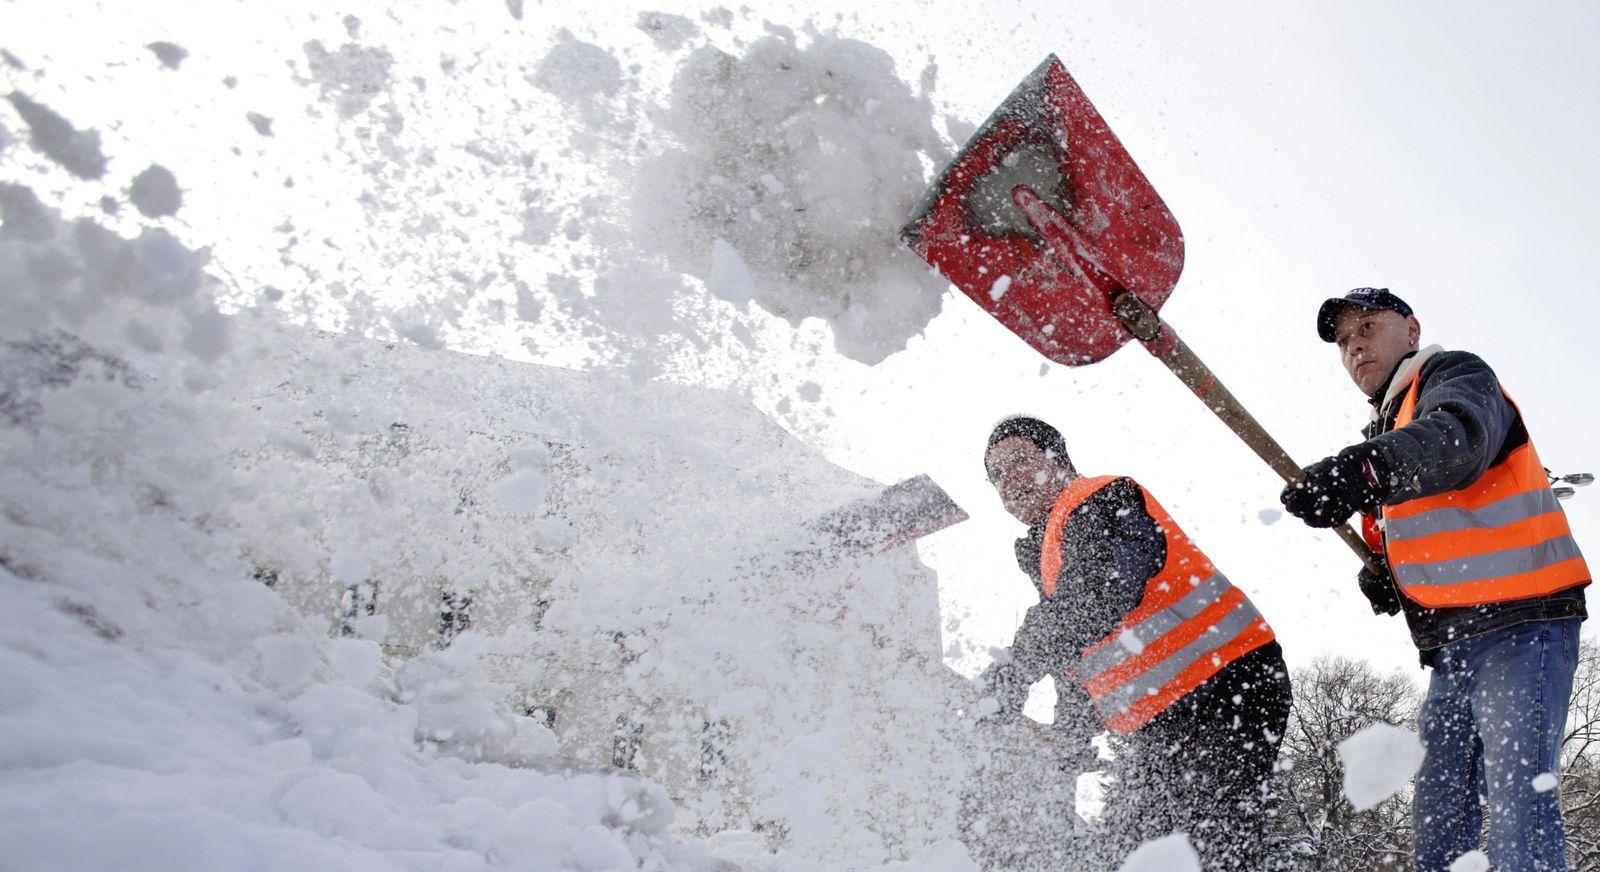 1-Euro-Jobber räumen Schnee